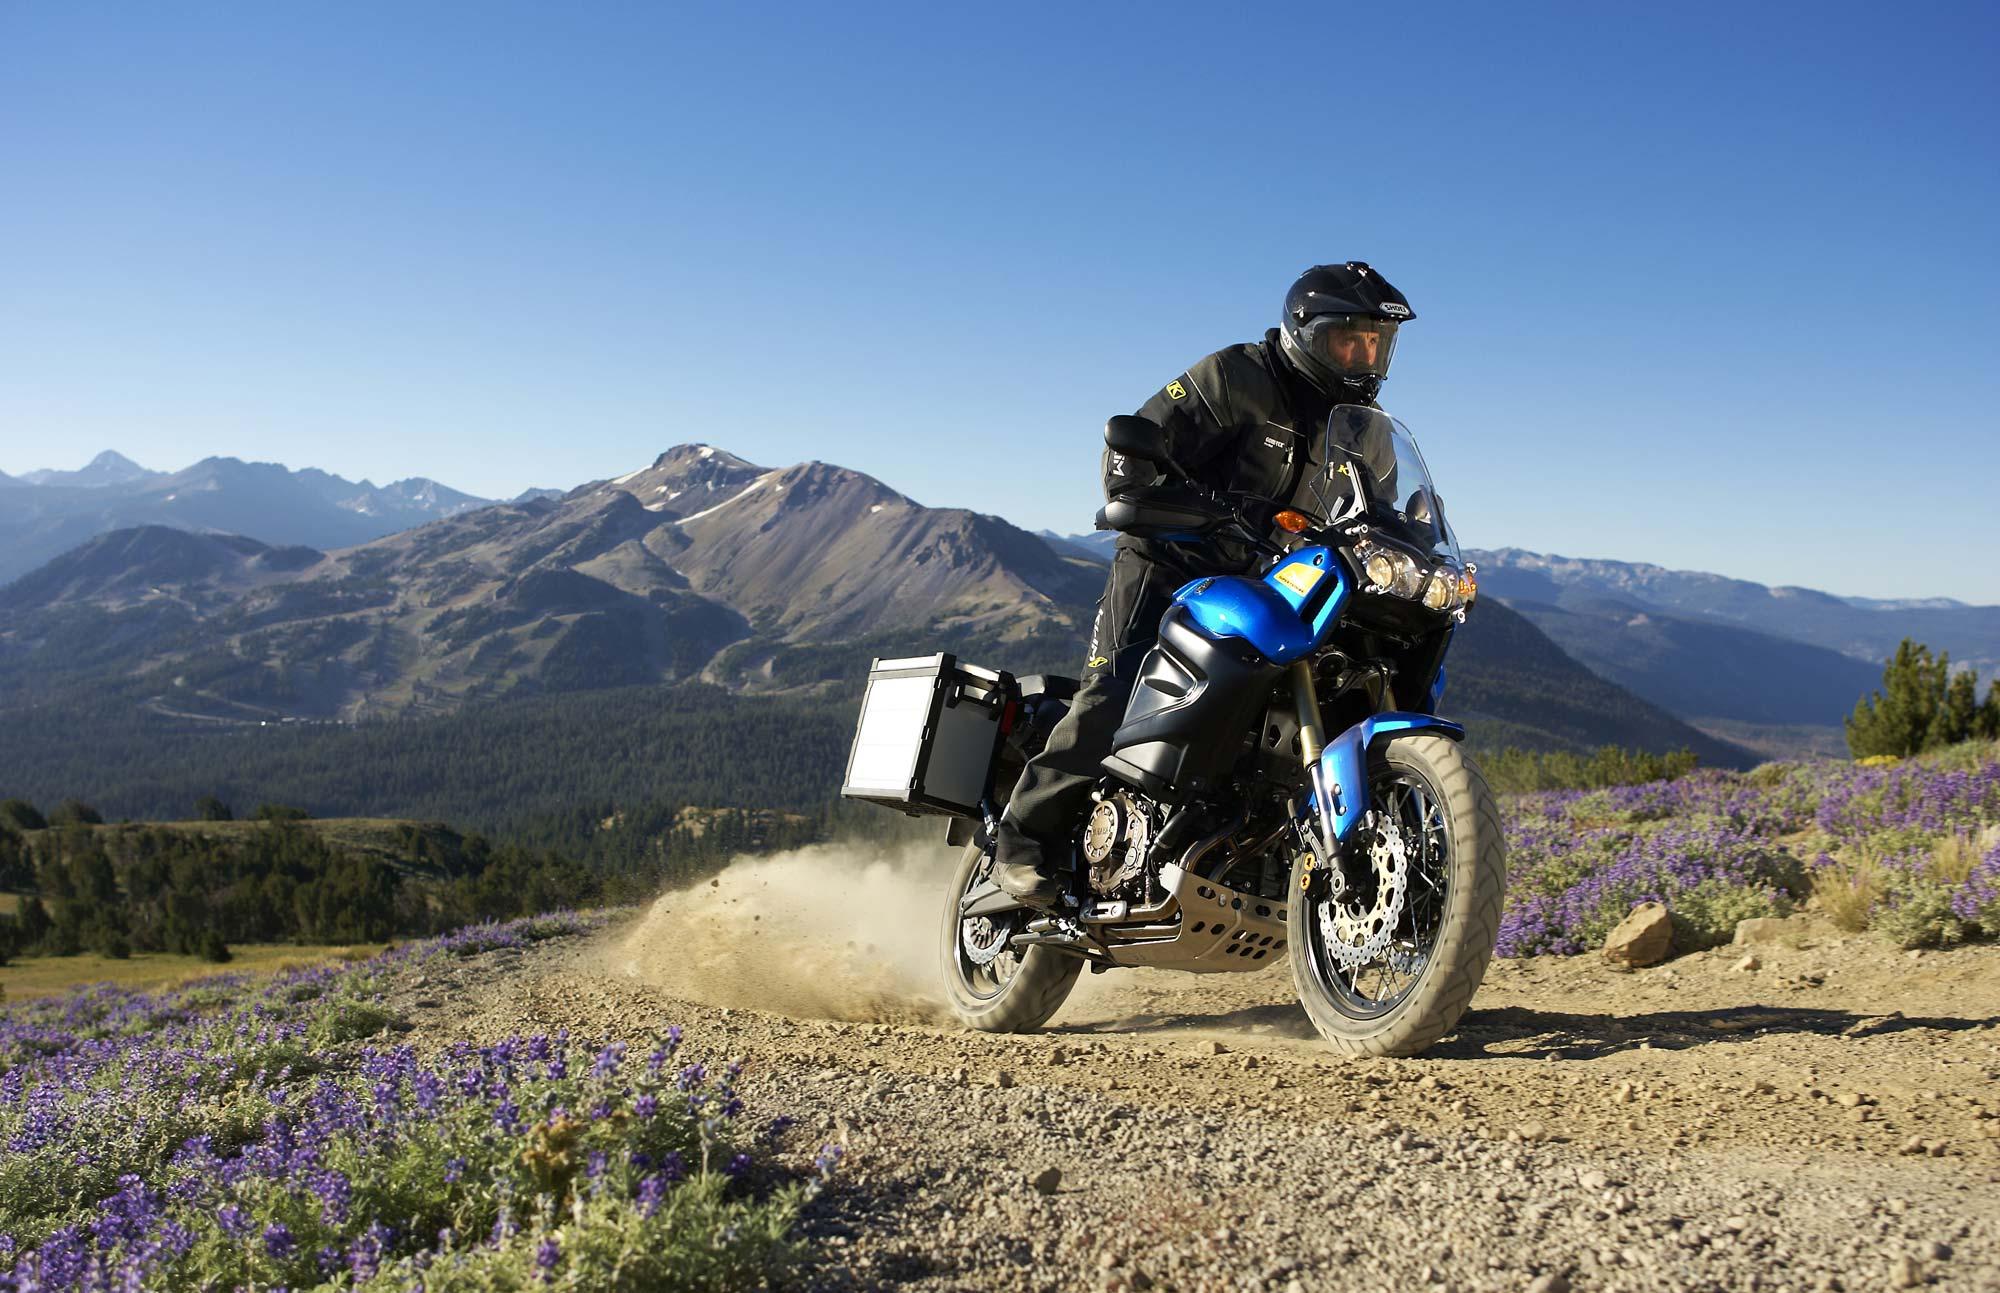 Technical Specifications of the 2012 Yamaha XT1200Z Super Ténéré: